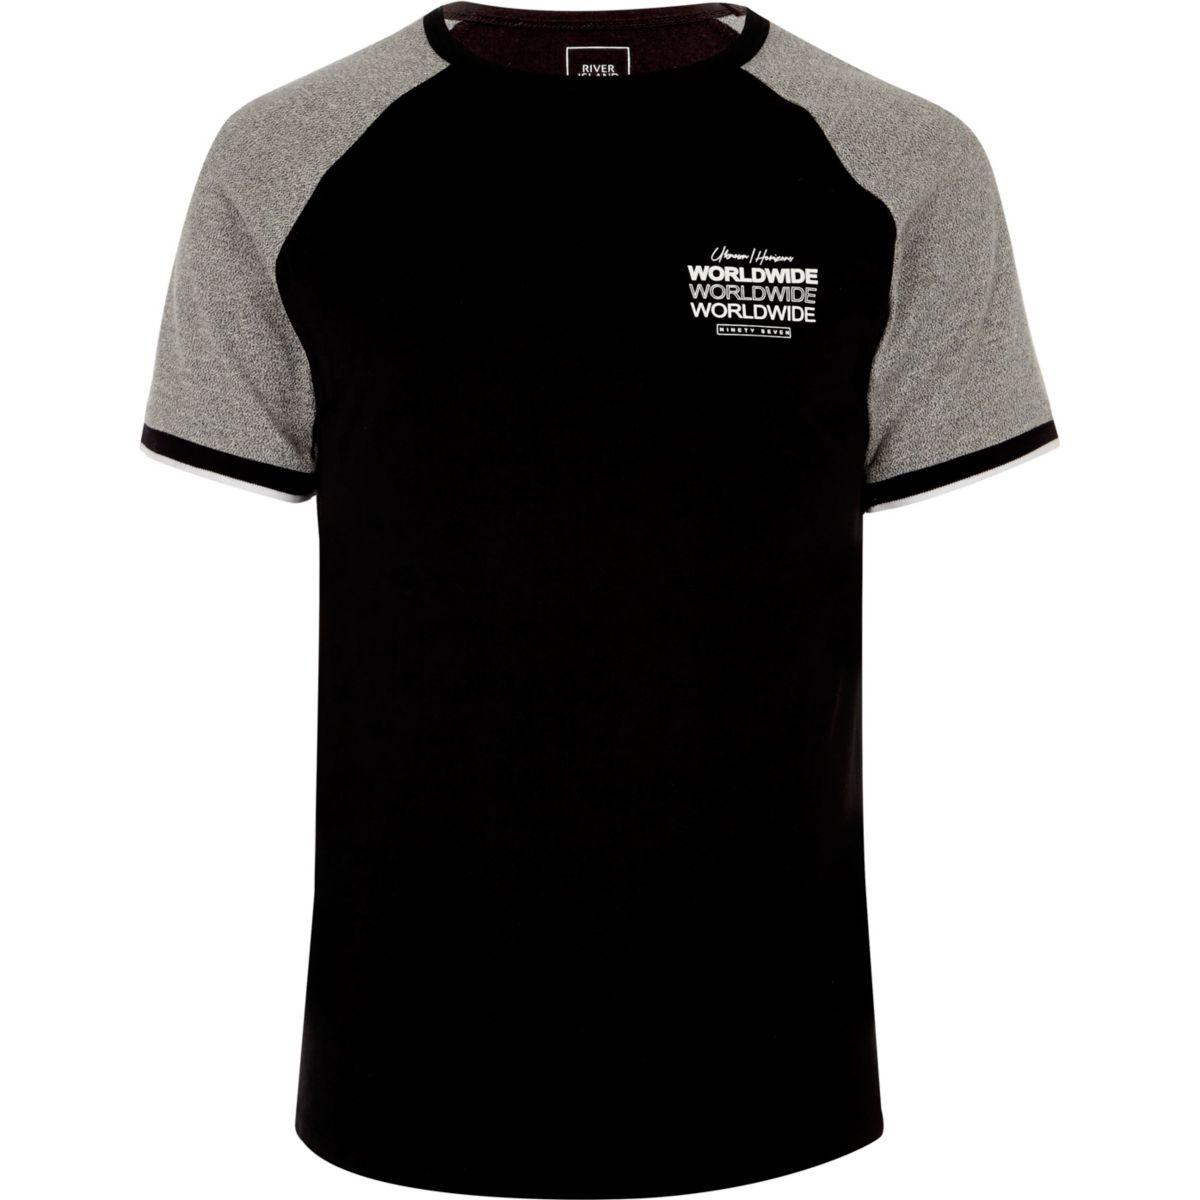 Black short sleeve 'worldwide' raglan T-shirt